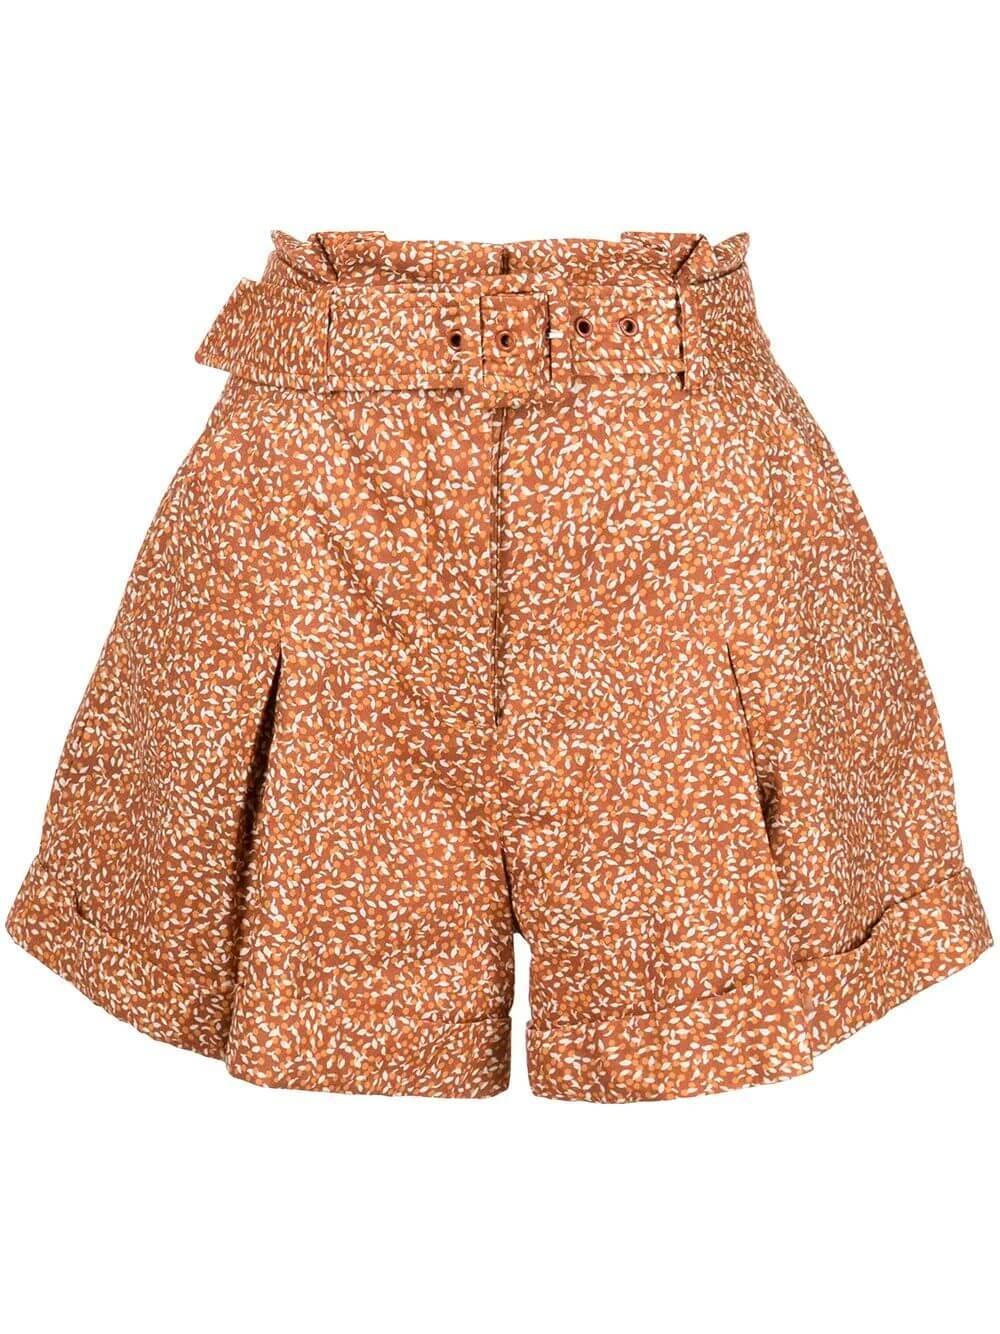 Lilian Linen Shorts Item # 321-4048-I